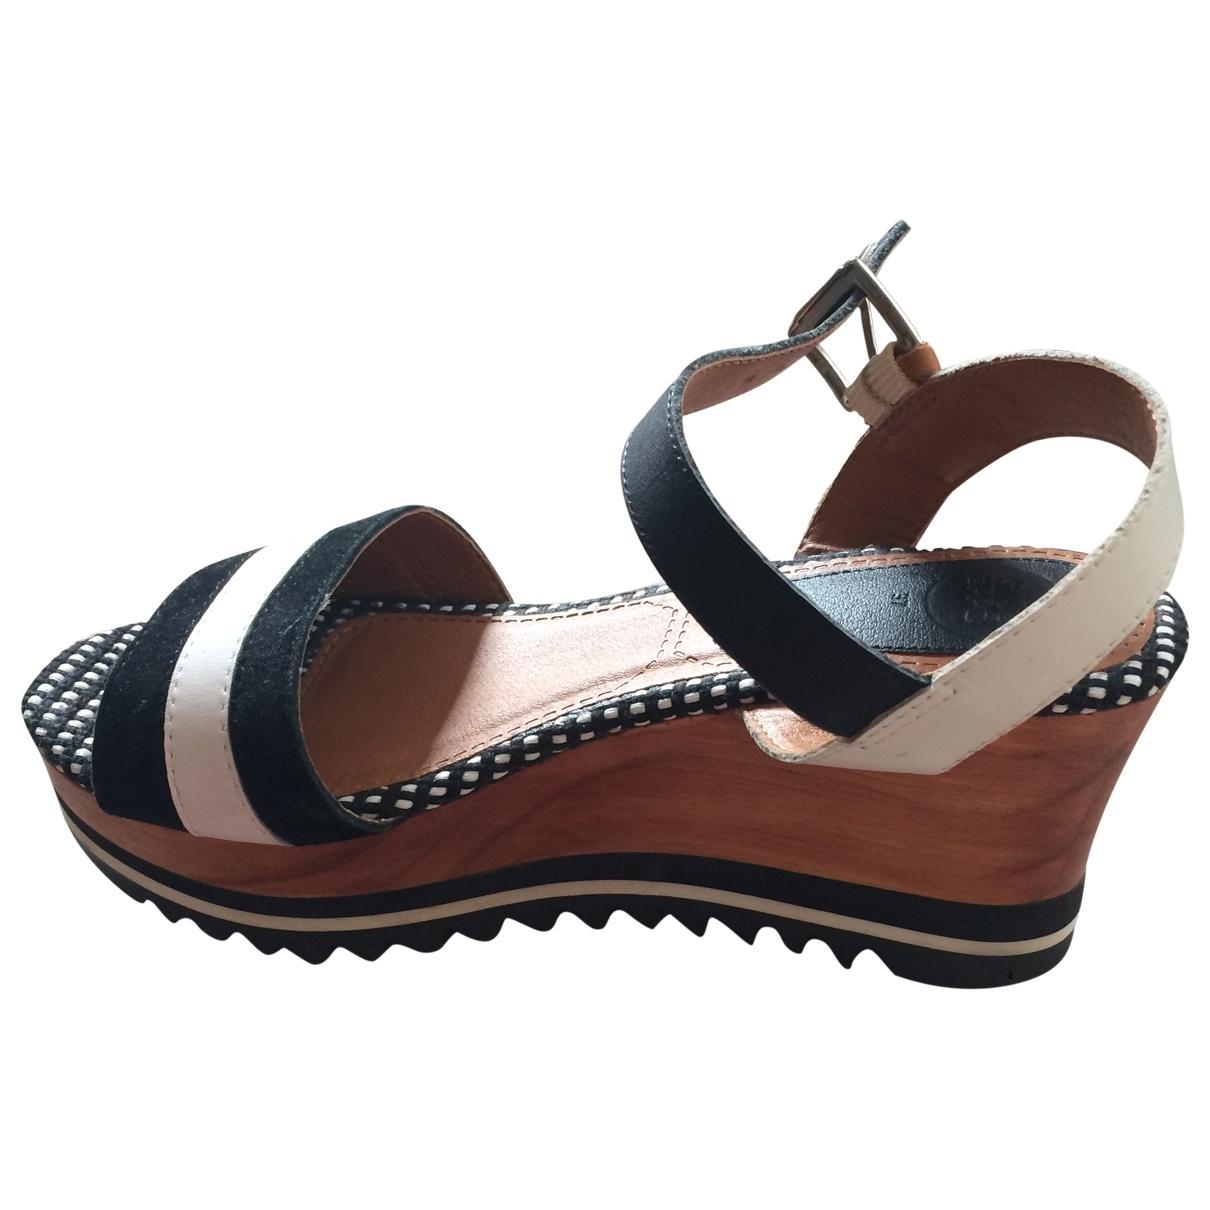 Gioseppo \N Black Leather Sandals for Women 37 EU